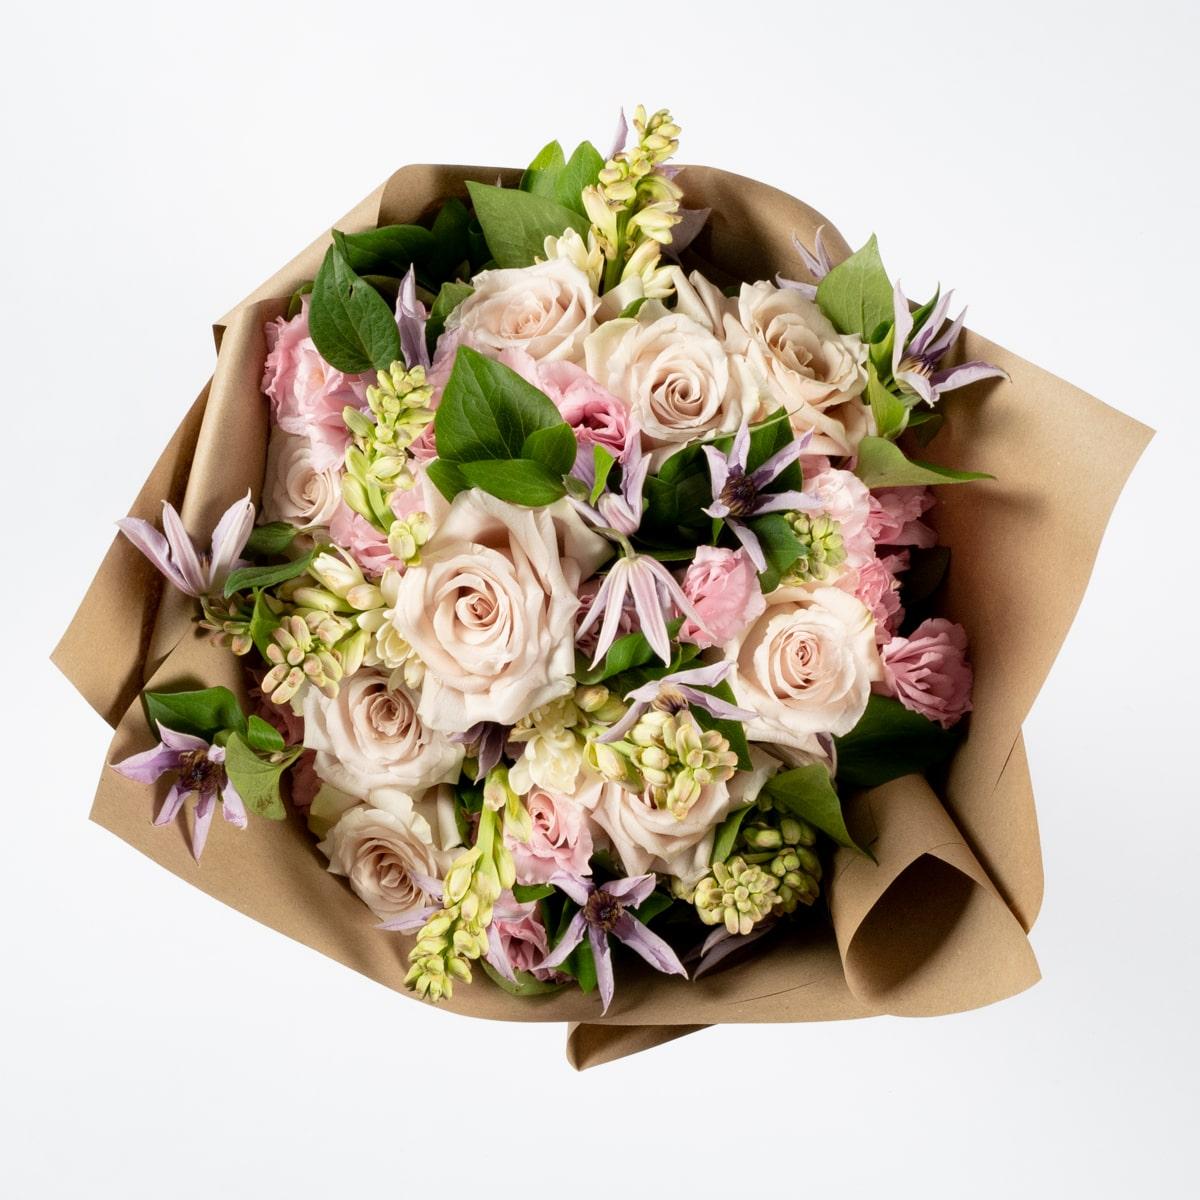 Bloom Flower Delivery | Ledbury Bouquet